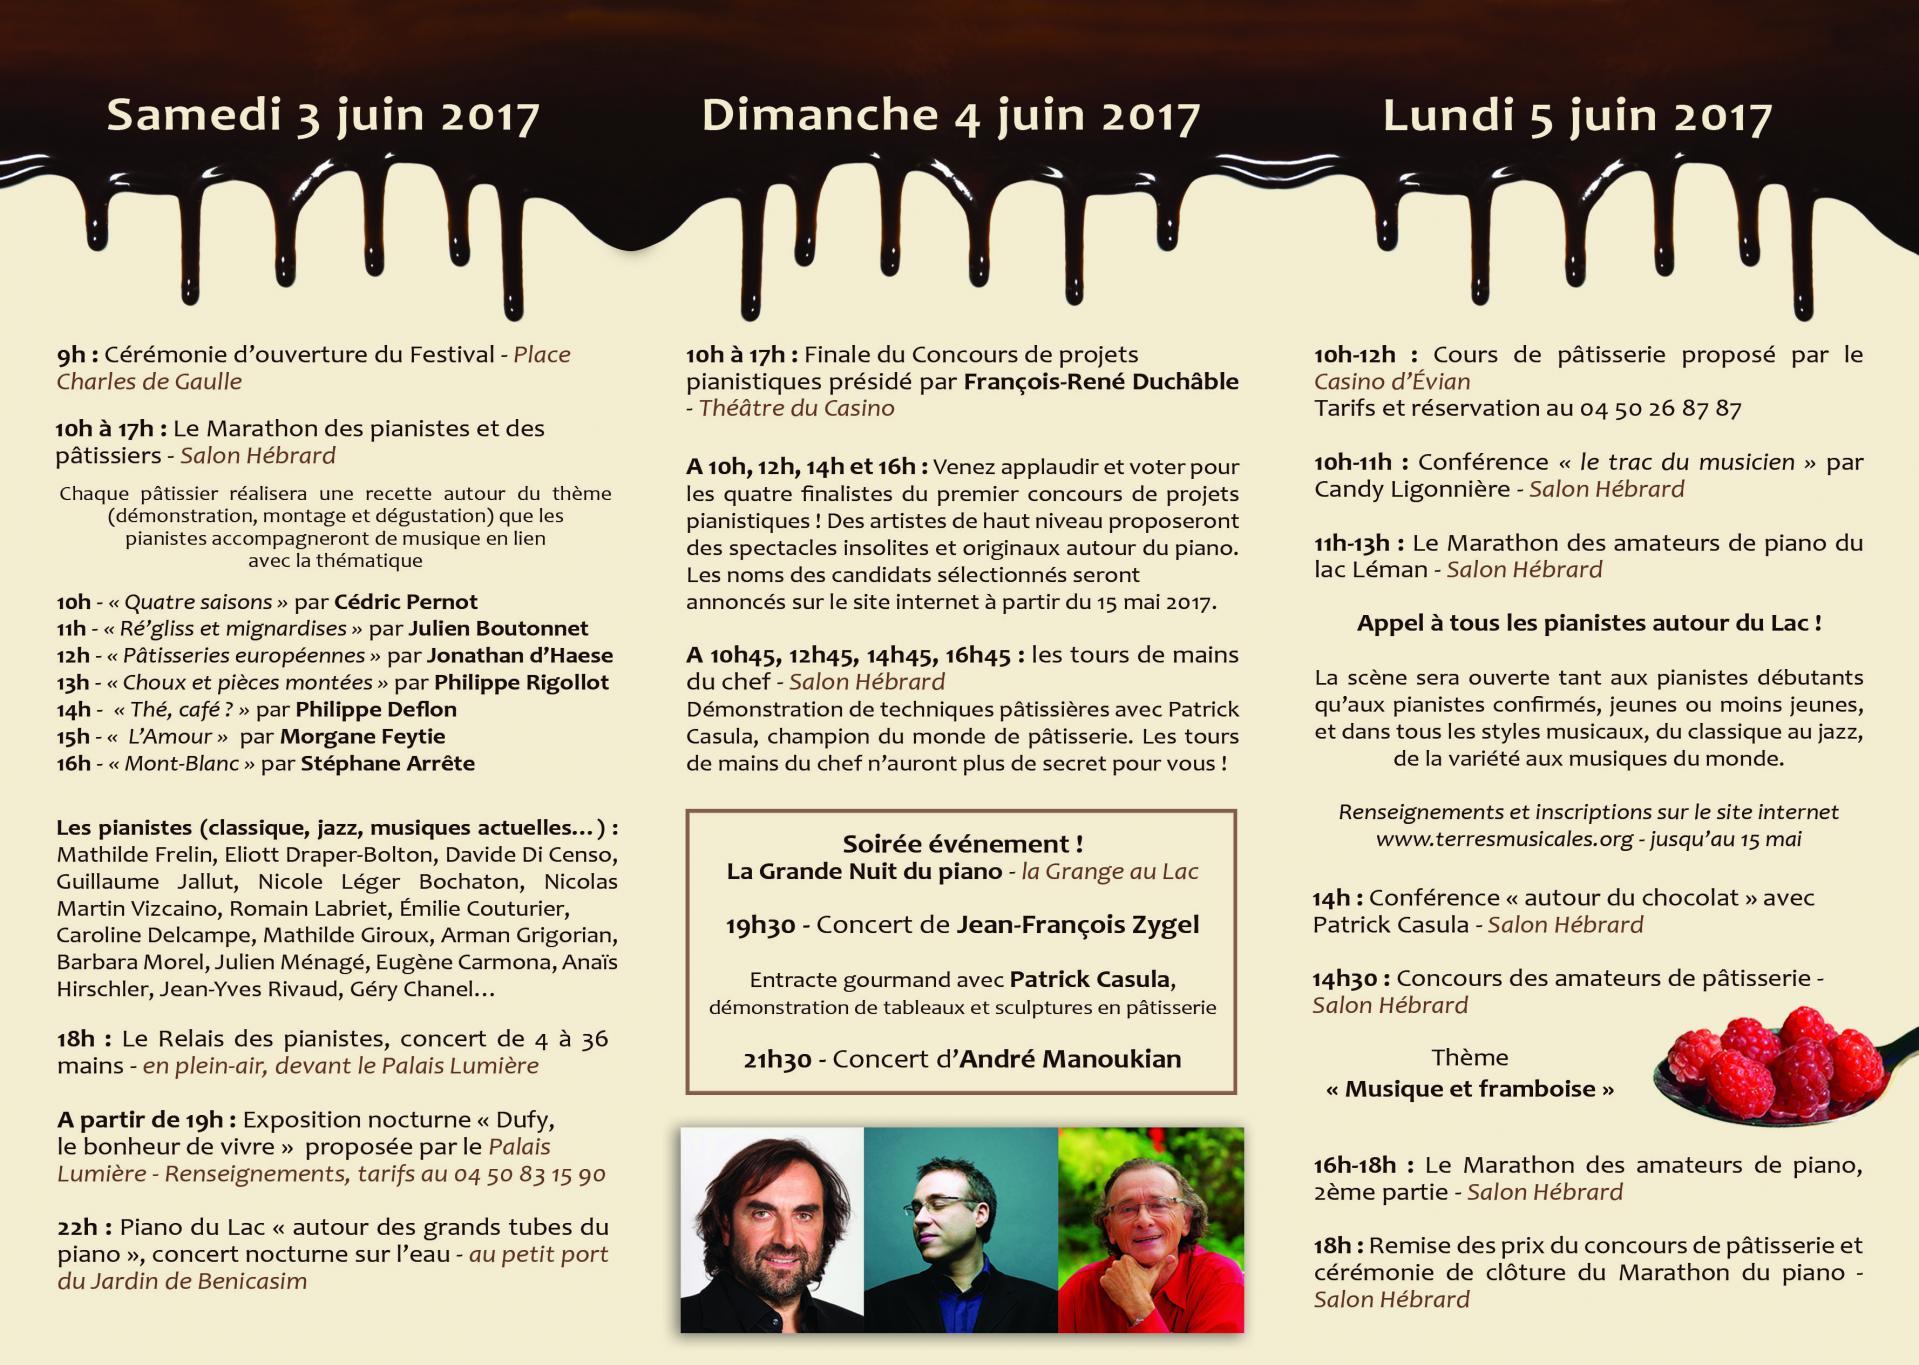 Marathon du piano 2017 programme